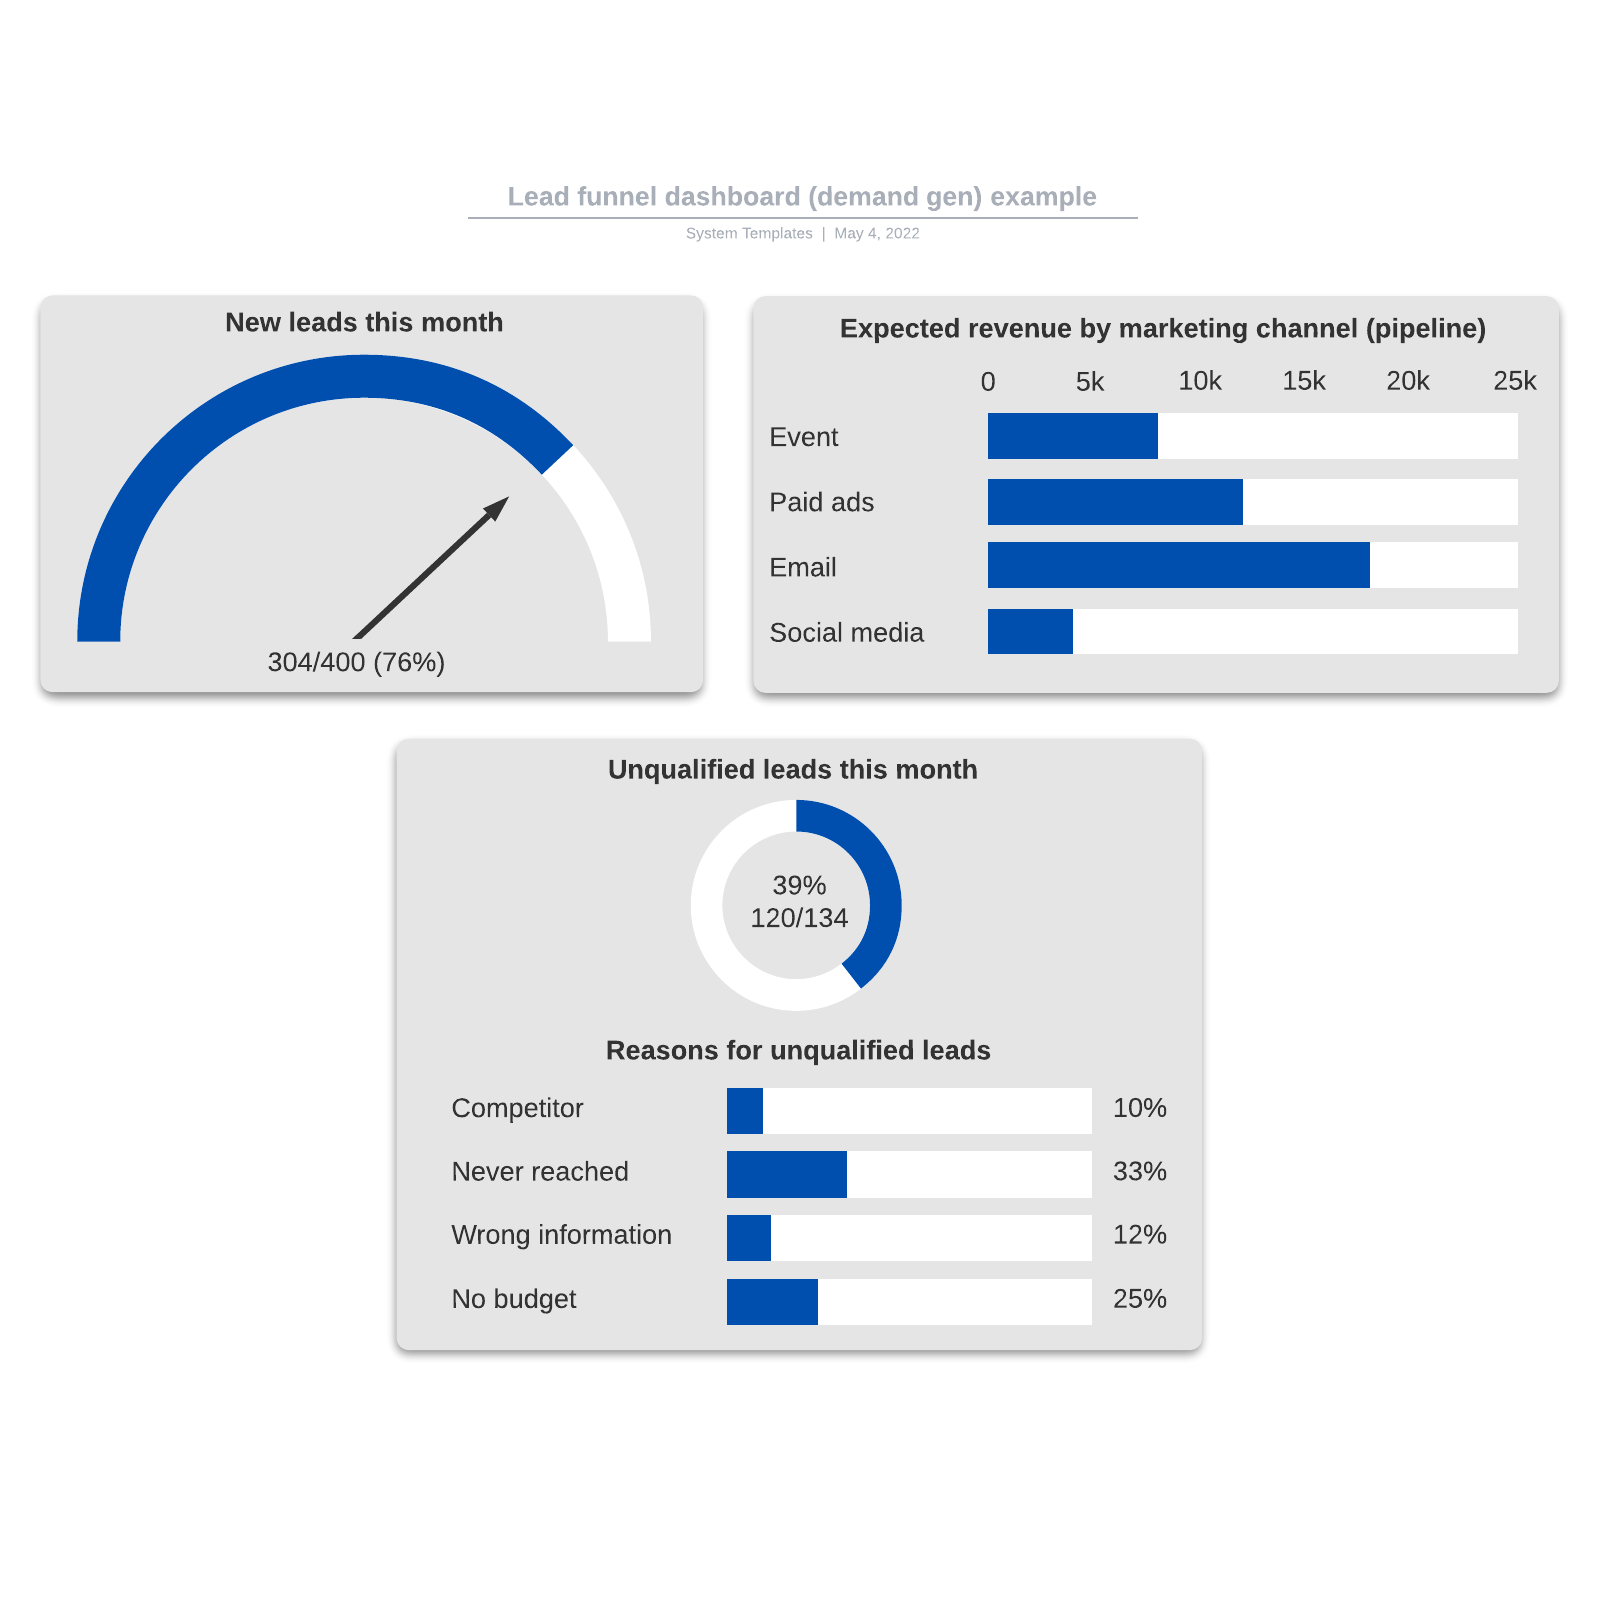 Lead funnel dashboard (demand gen) example